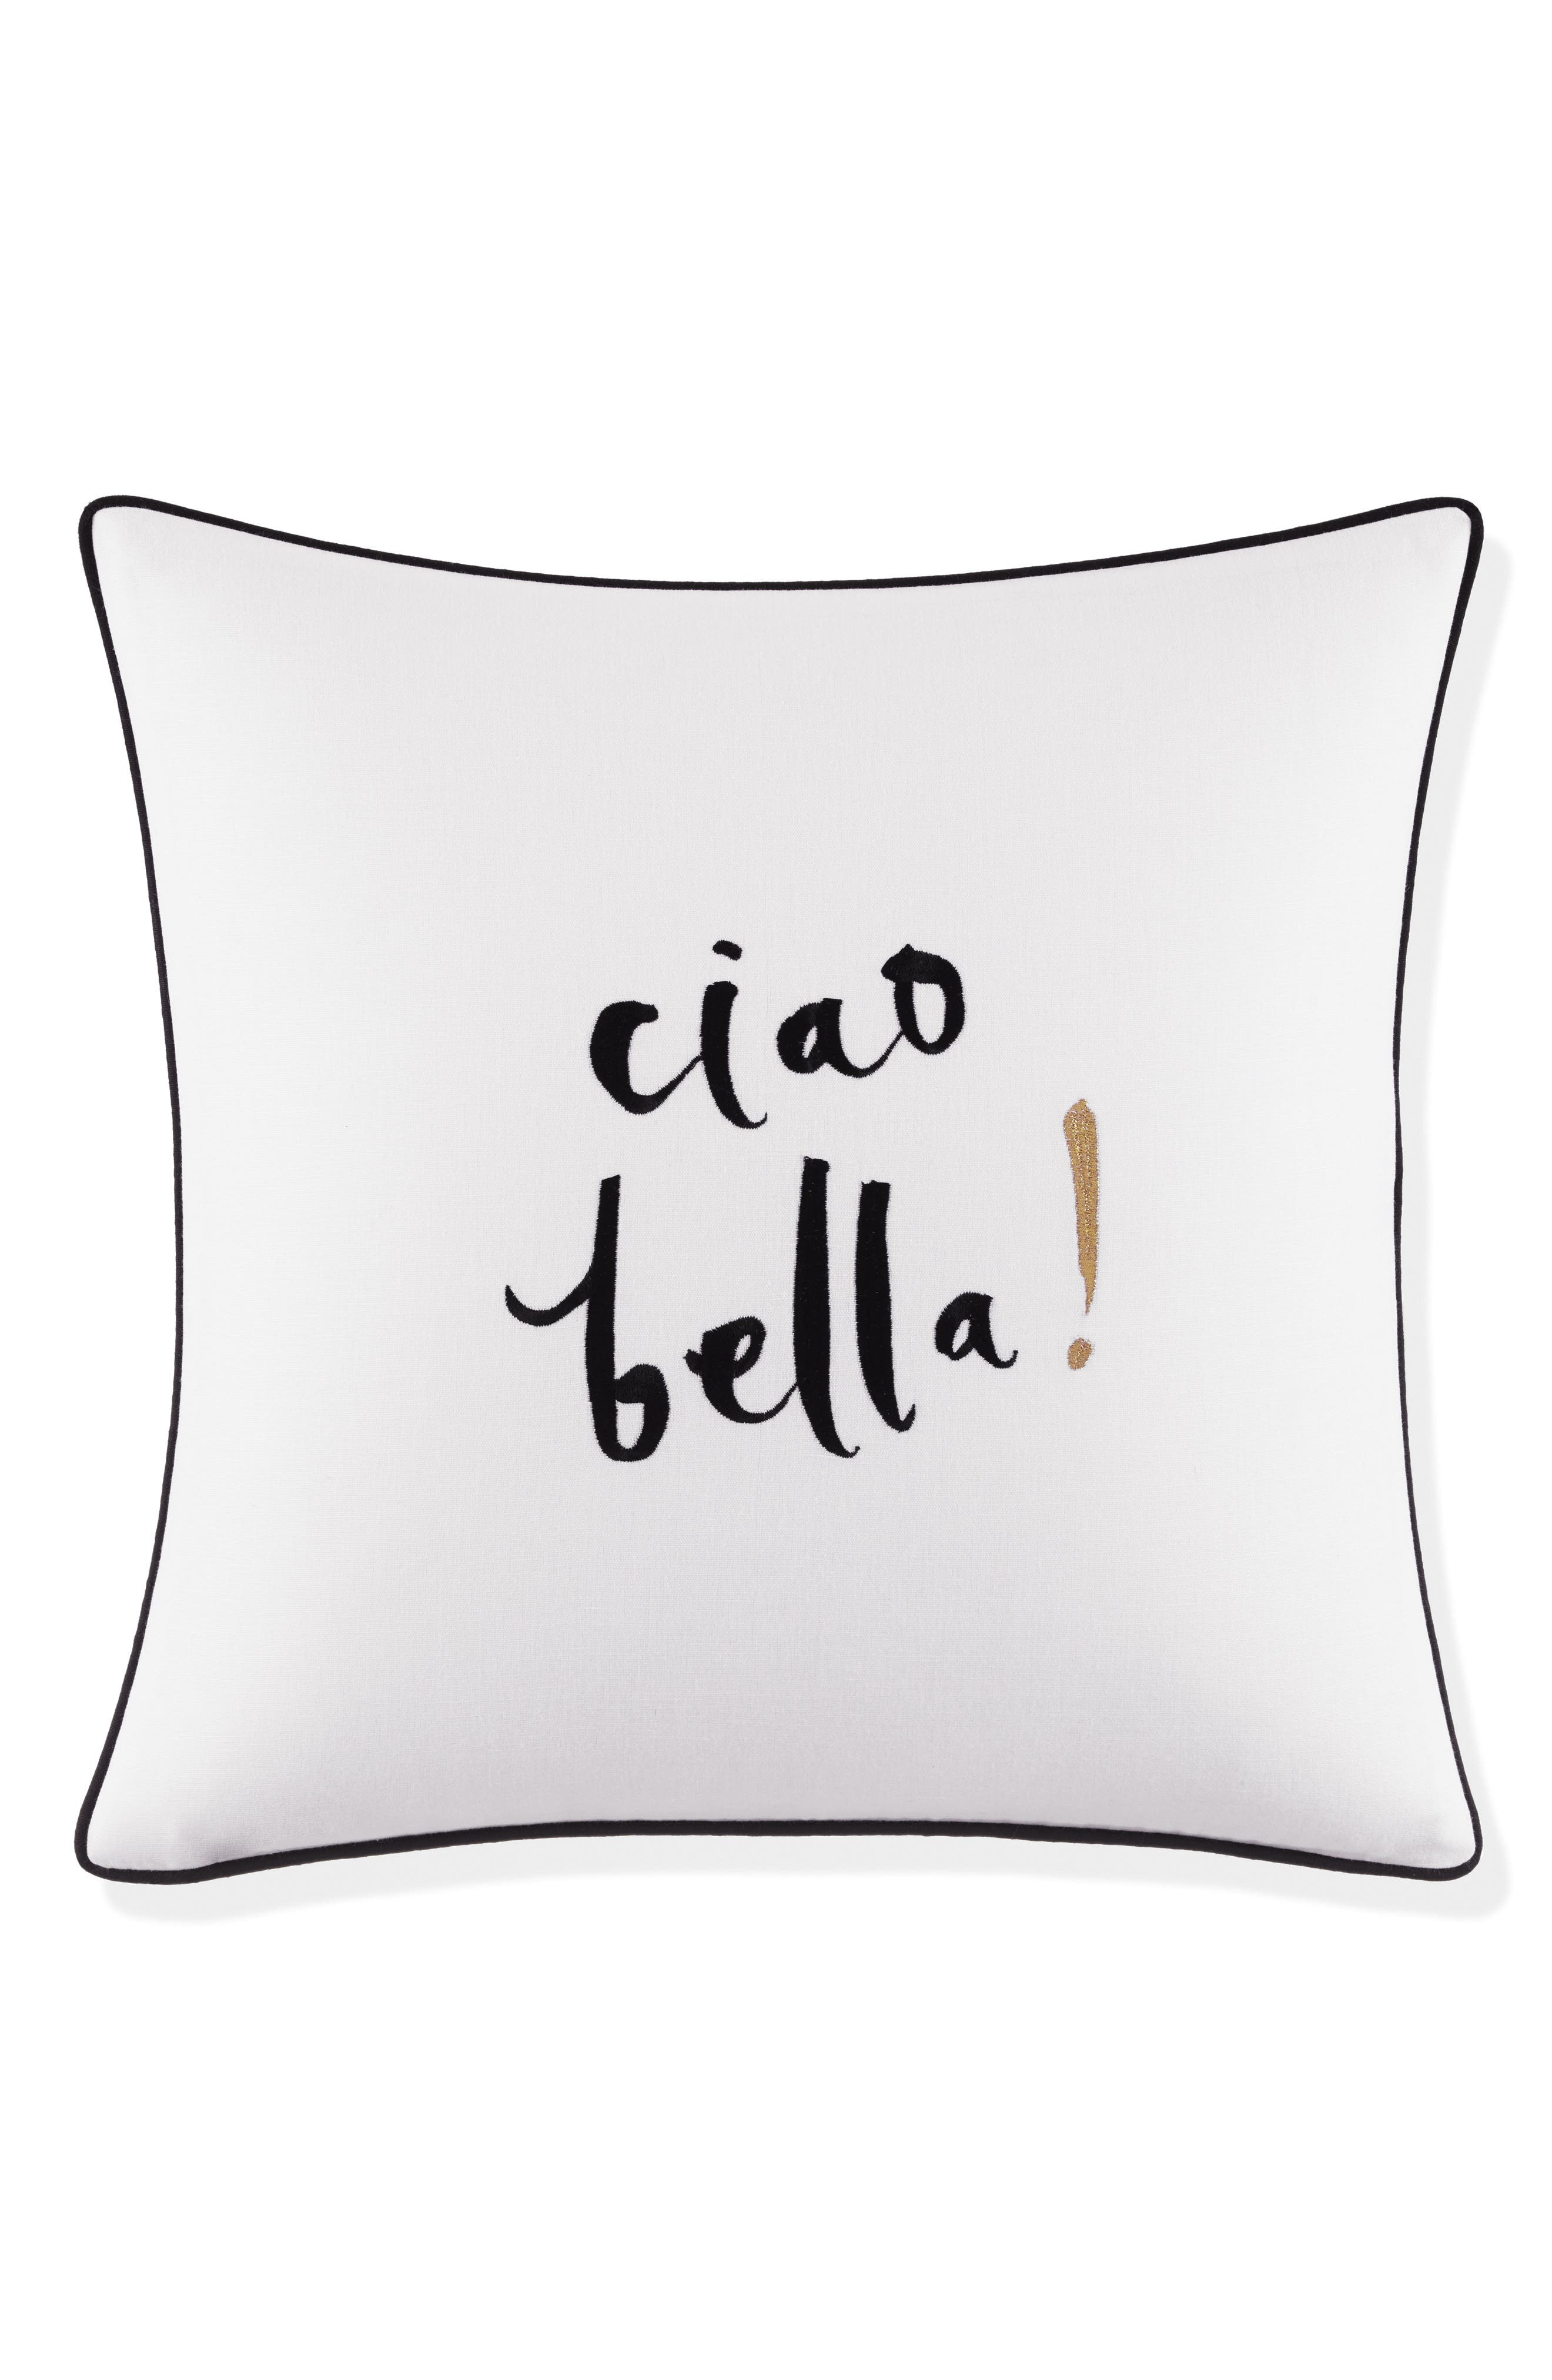 Main Image - kate spade new york ciao bella pillow